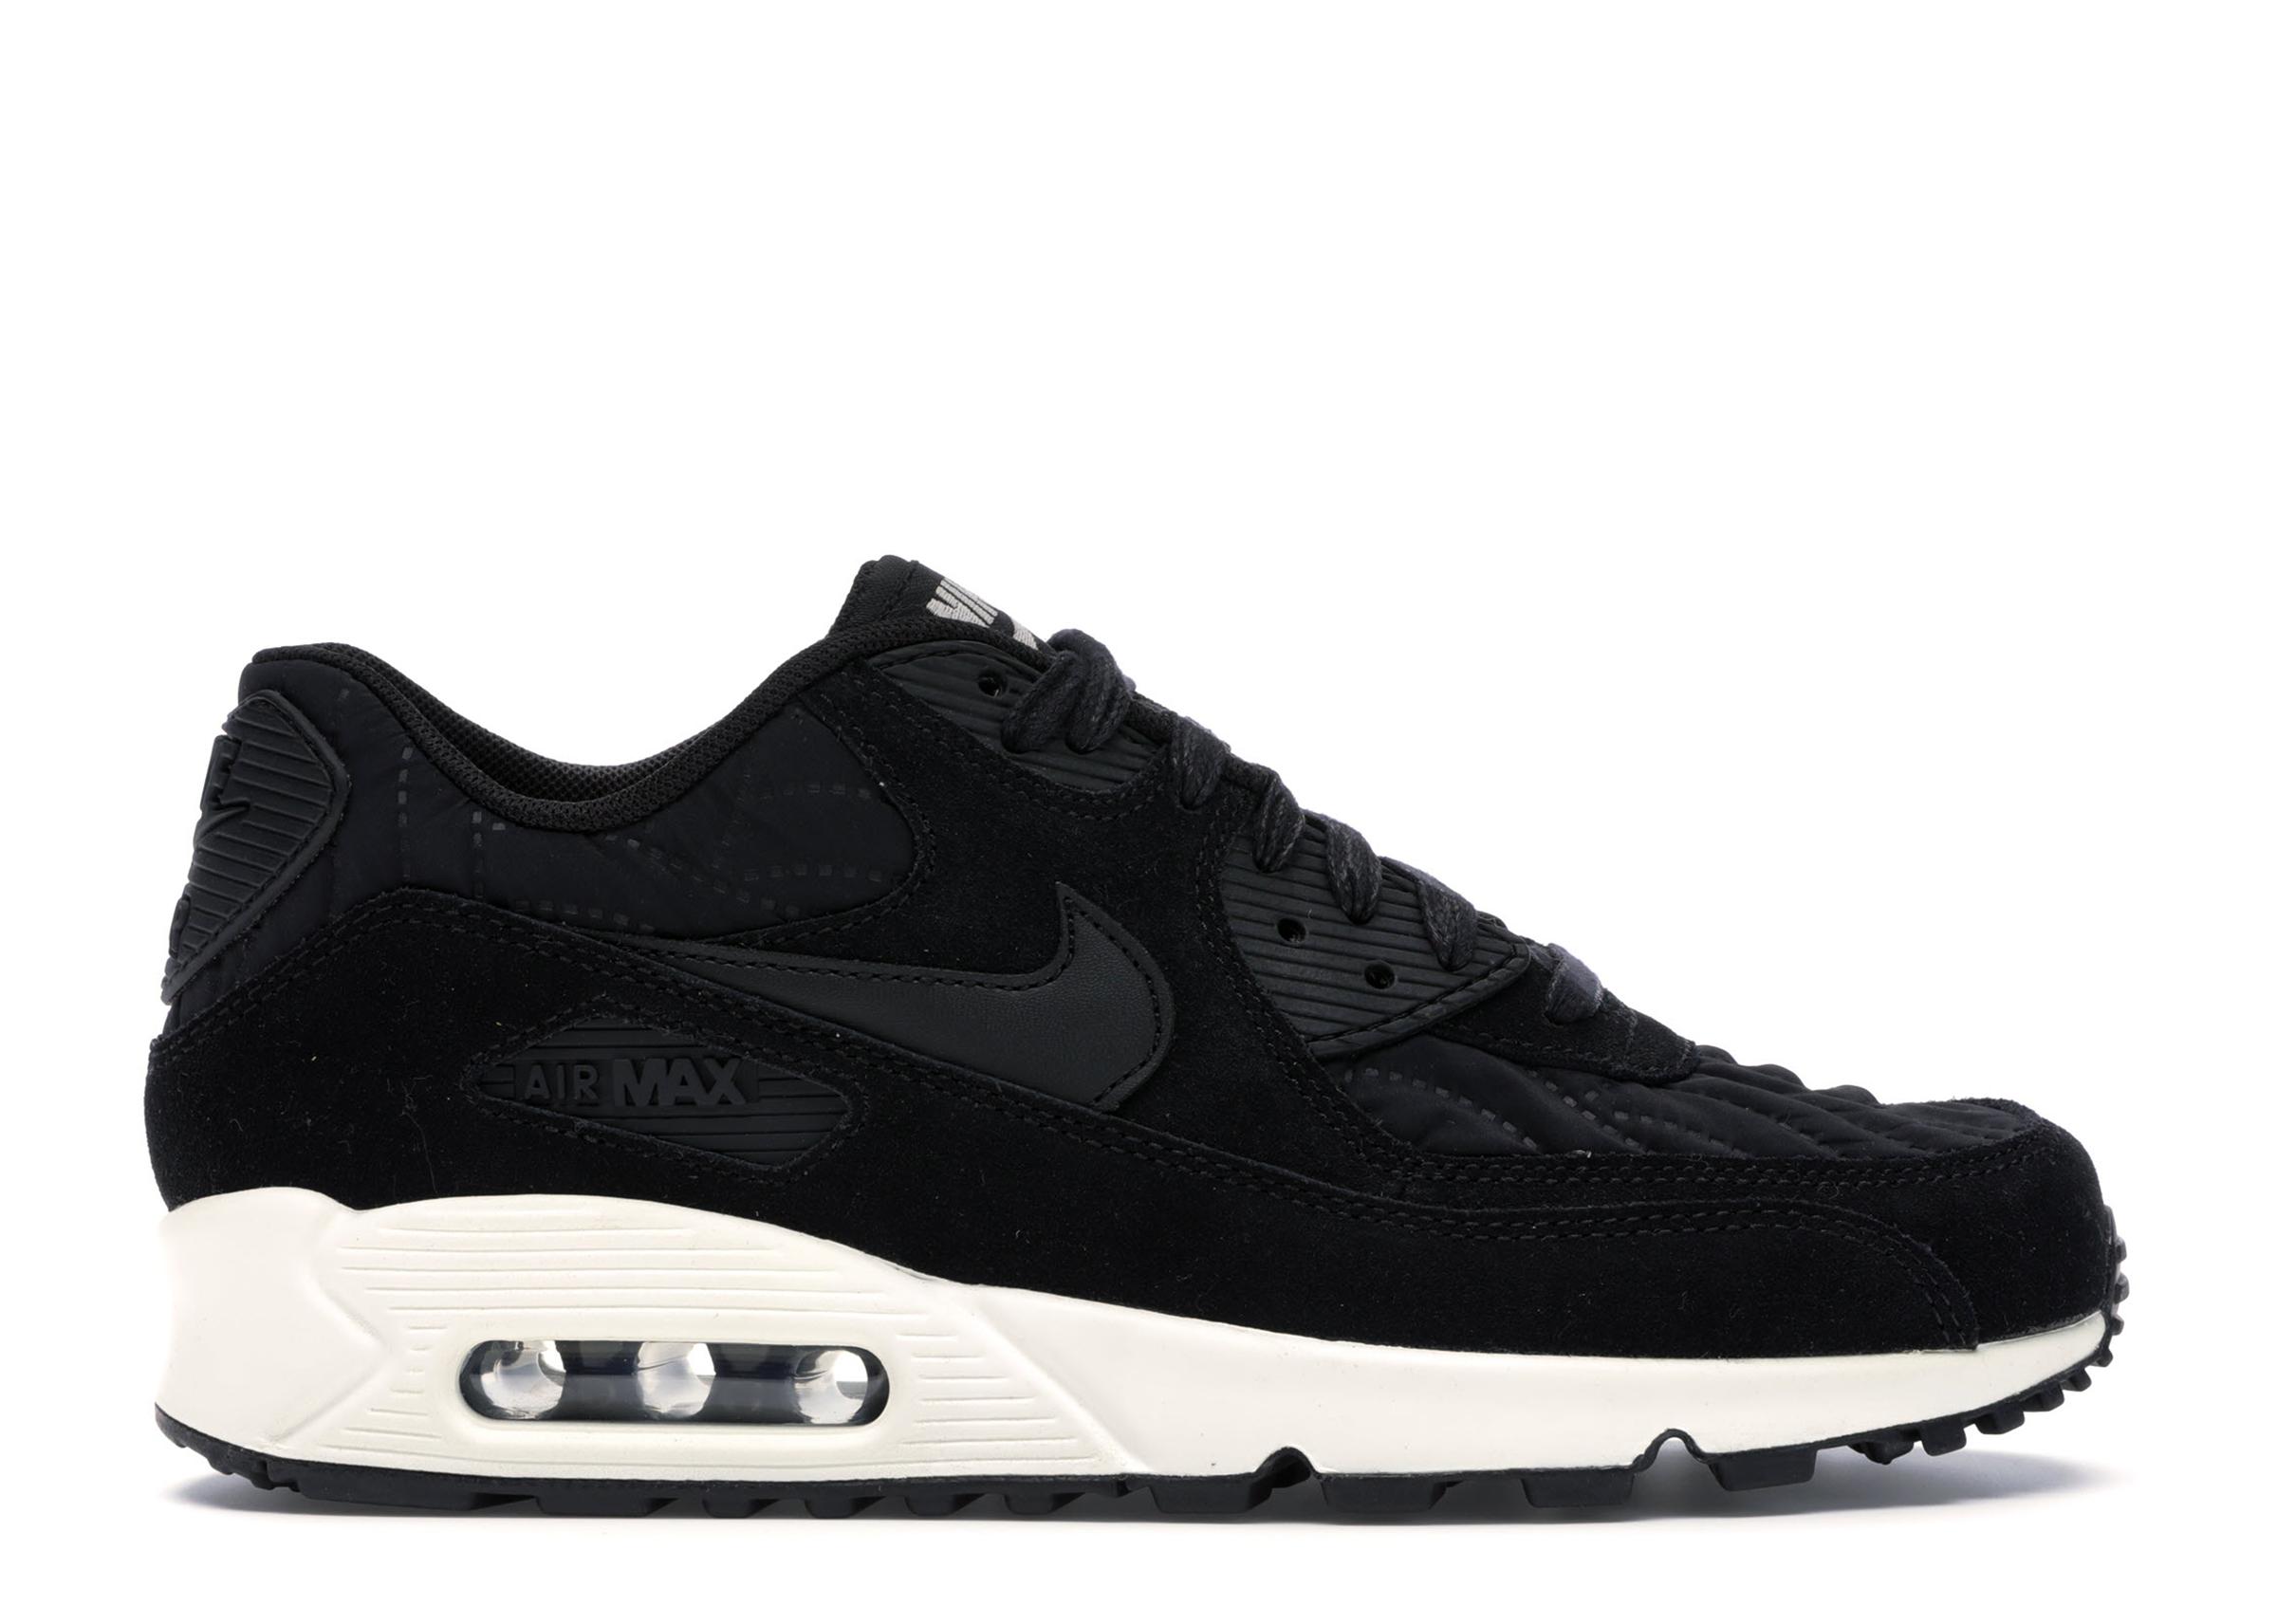 Nike Air Max 90 Black Ivory (W